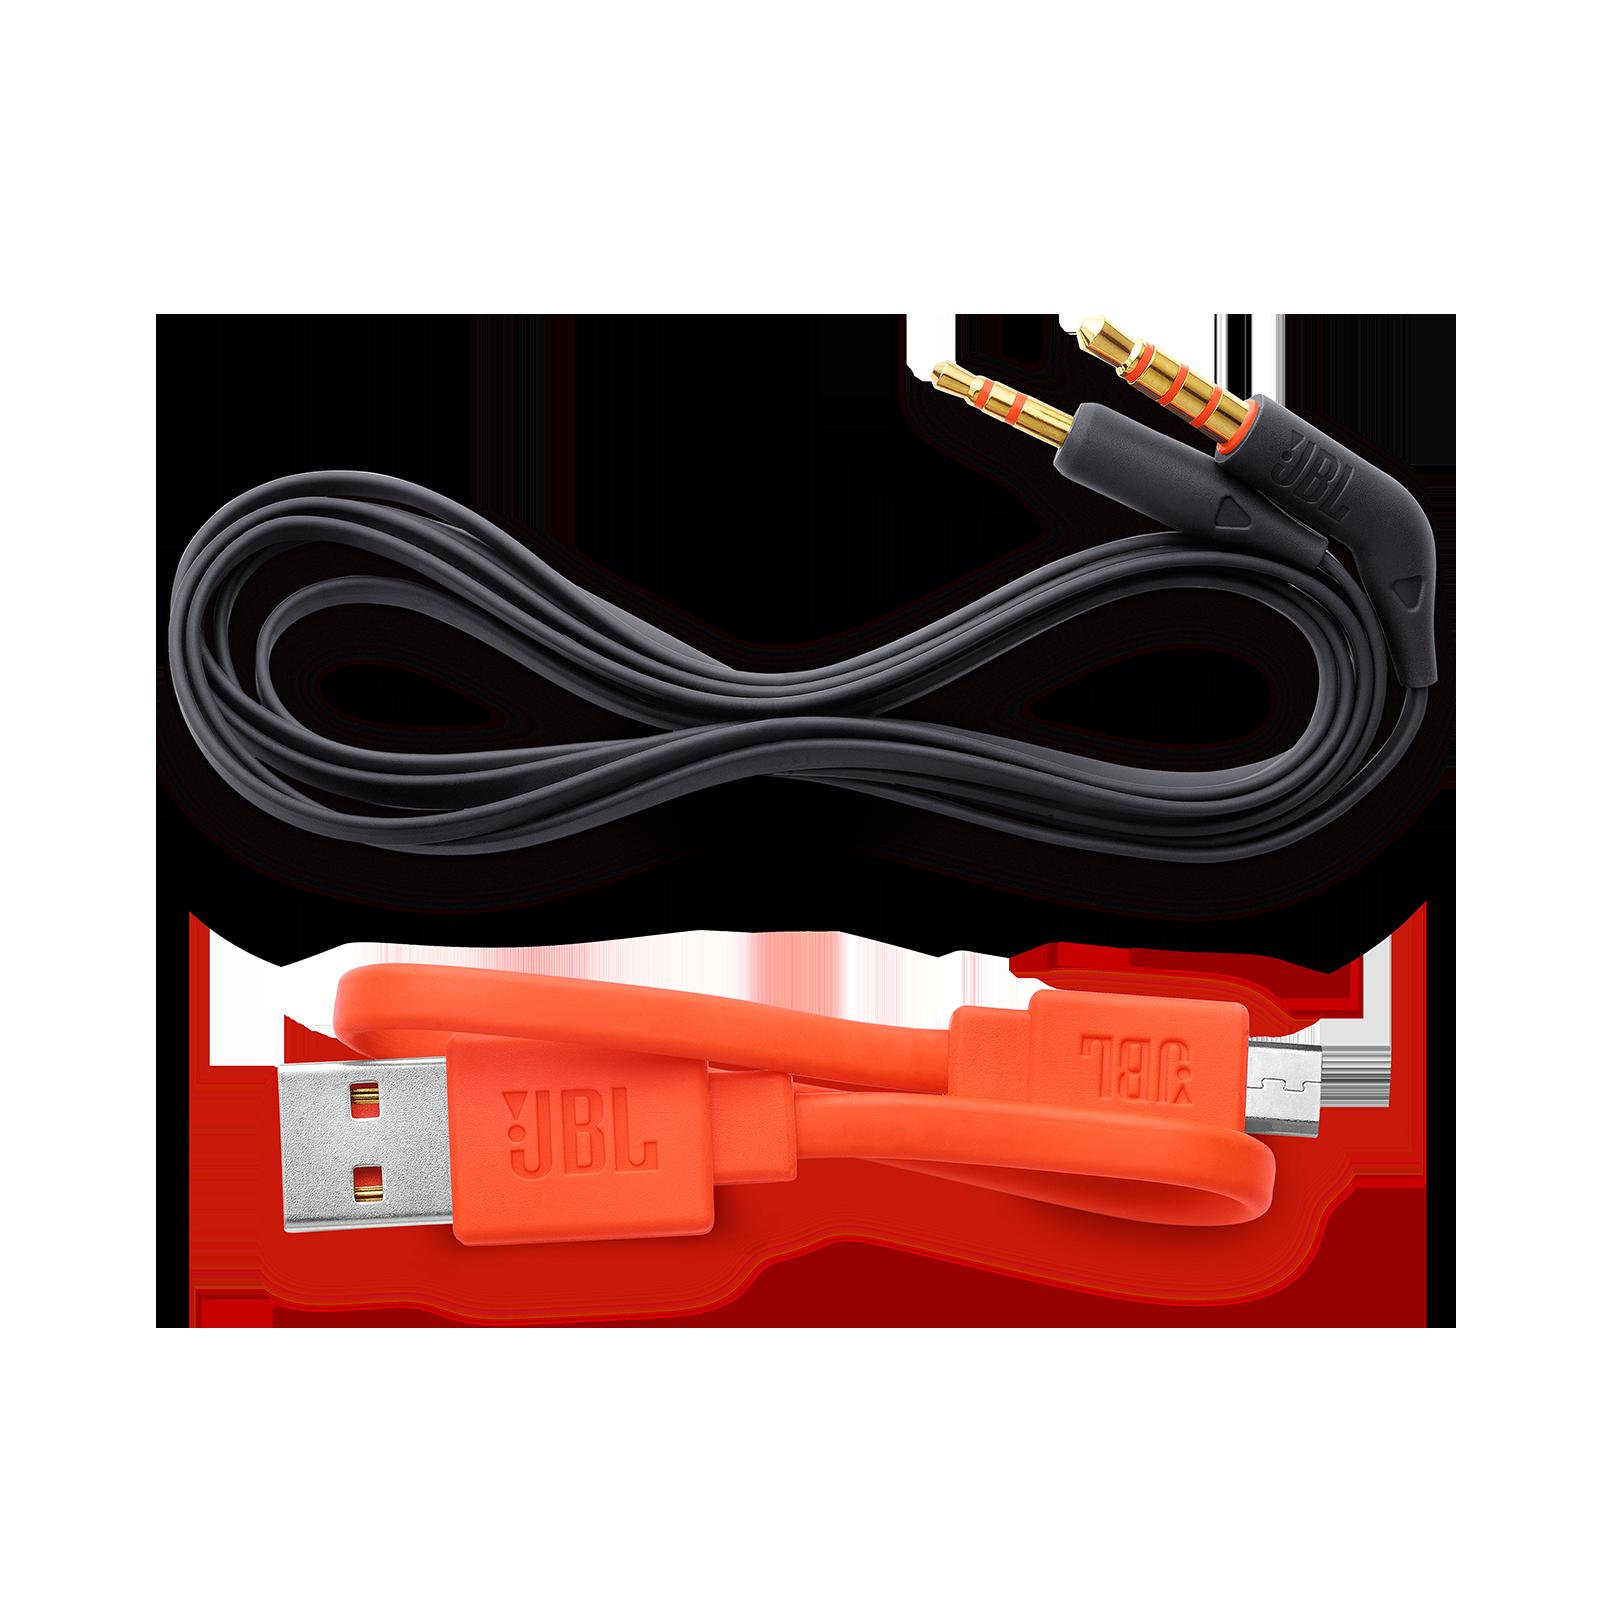 JBL TUNE 600BTNC - Black - Wireless, on-ear, active noise-cancelling headphones. - Detailshot 5